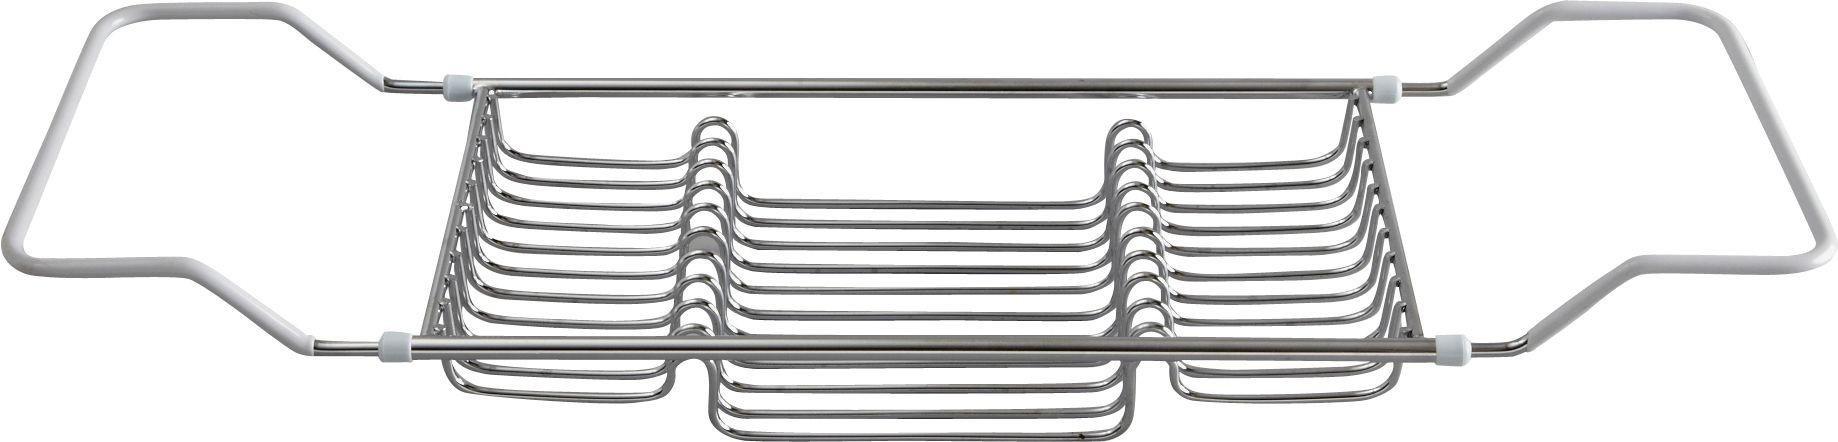 Image of HOME Over Bath Rack - Chrome Plated